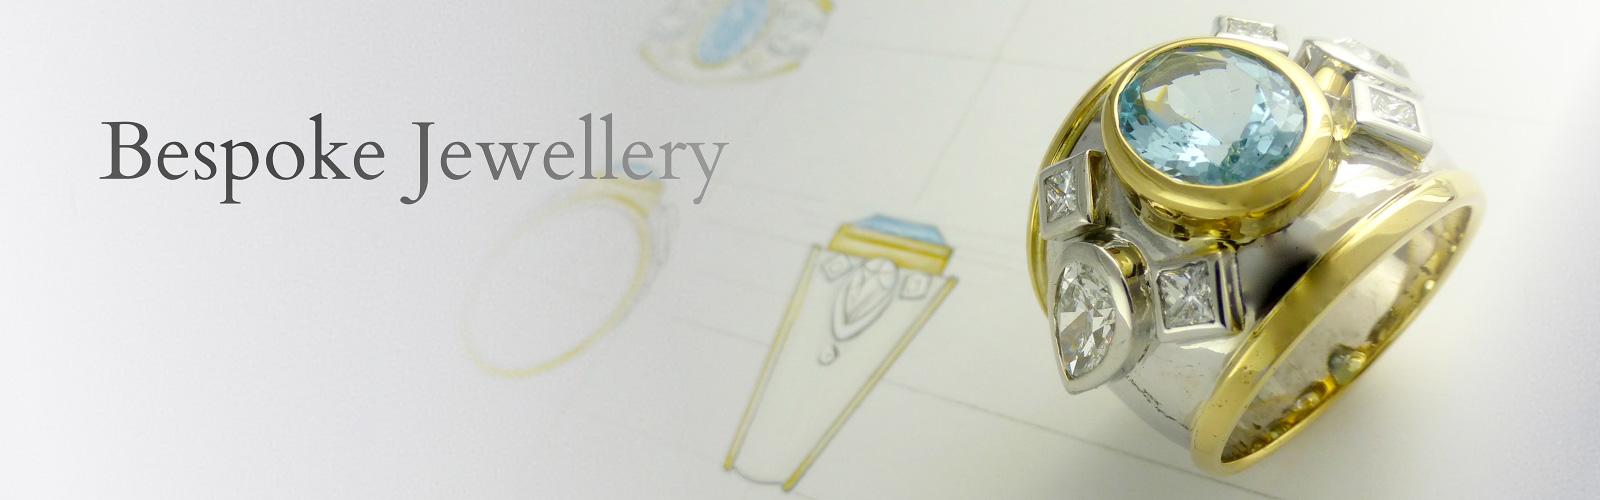 bespokeheader-10-9-15 Bespoke Jewellery